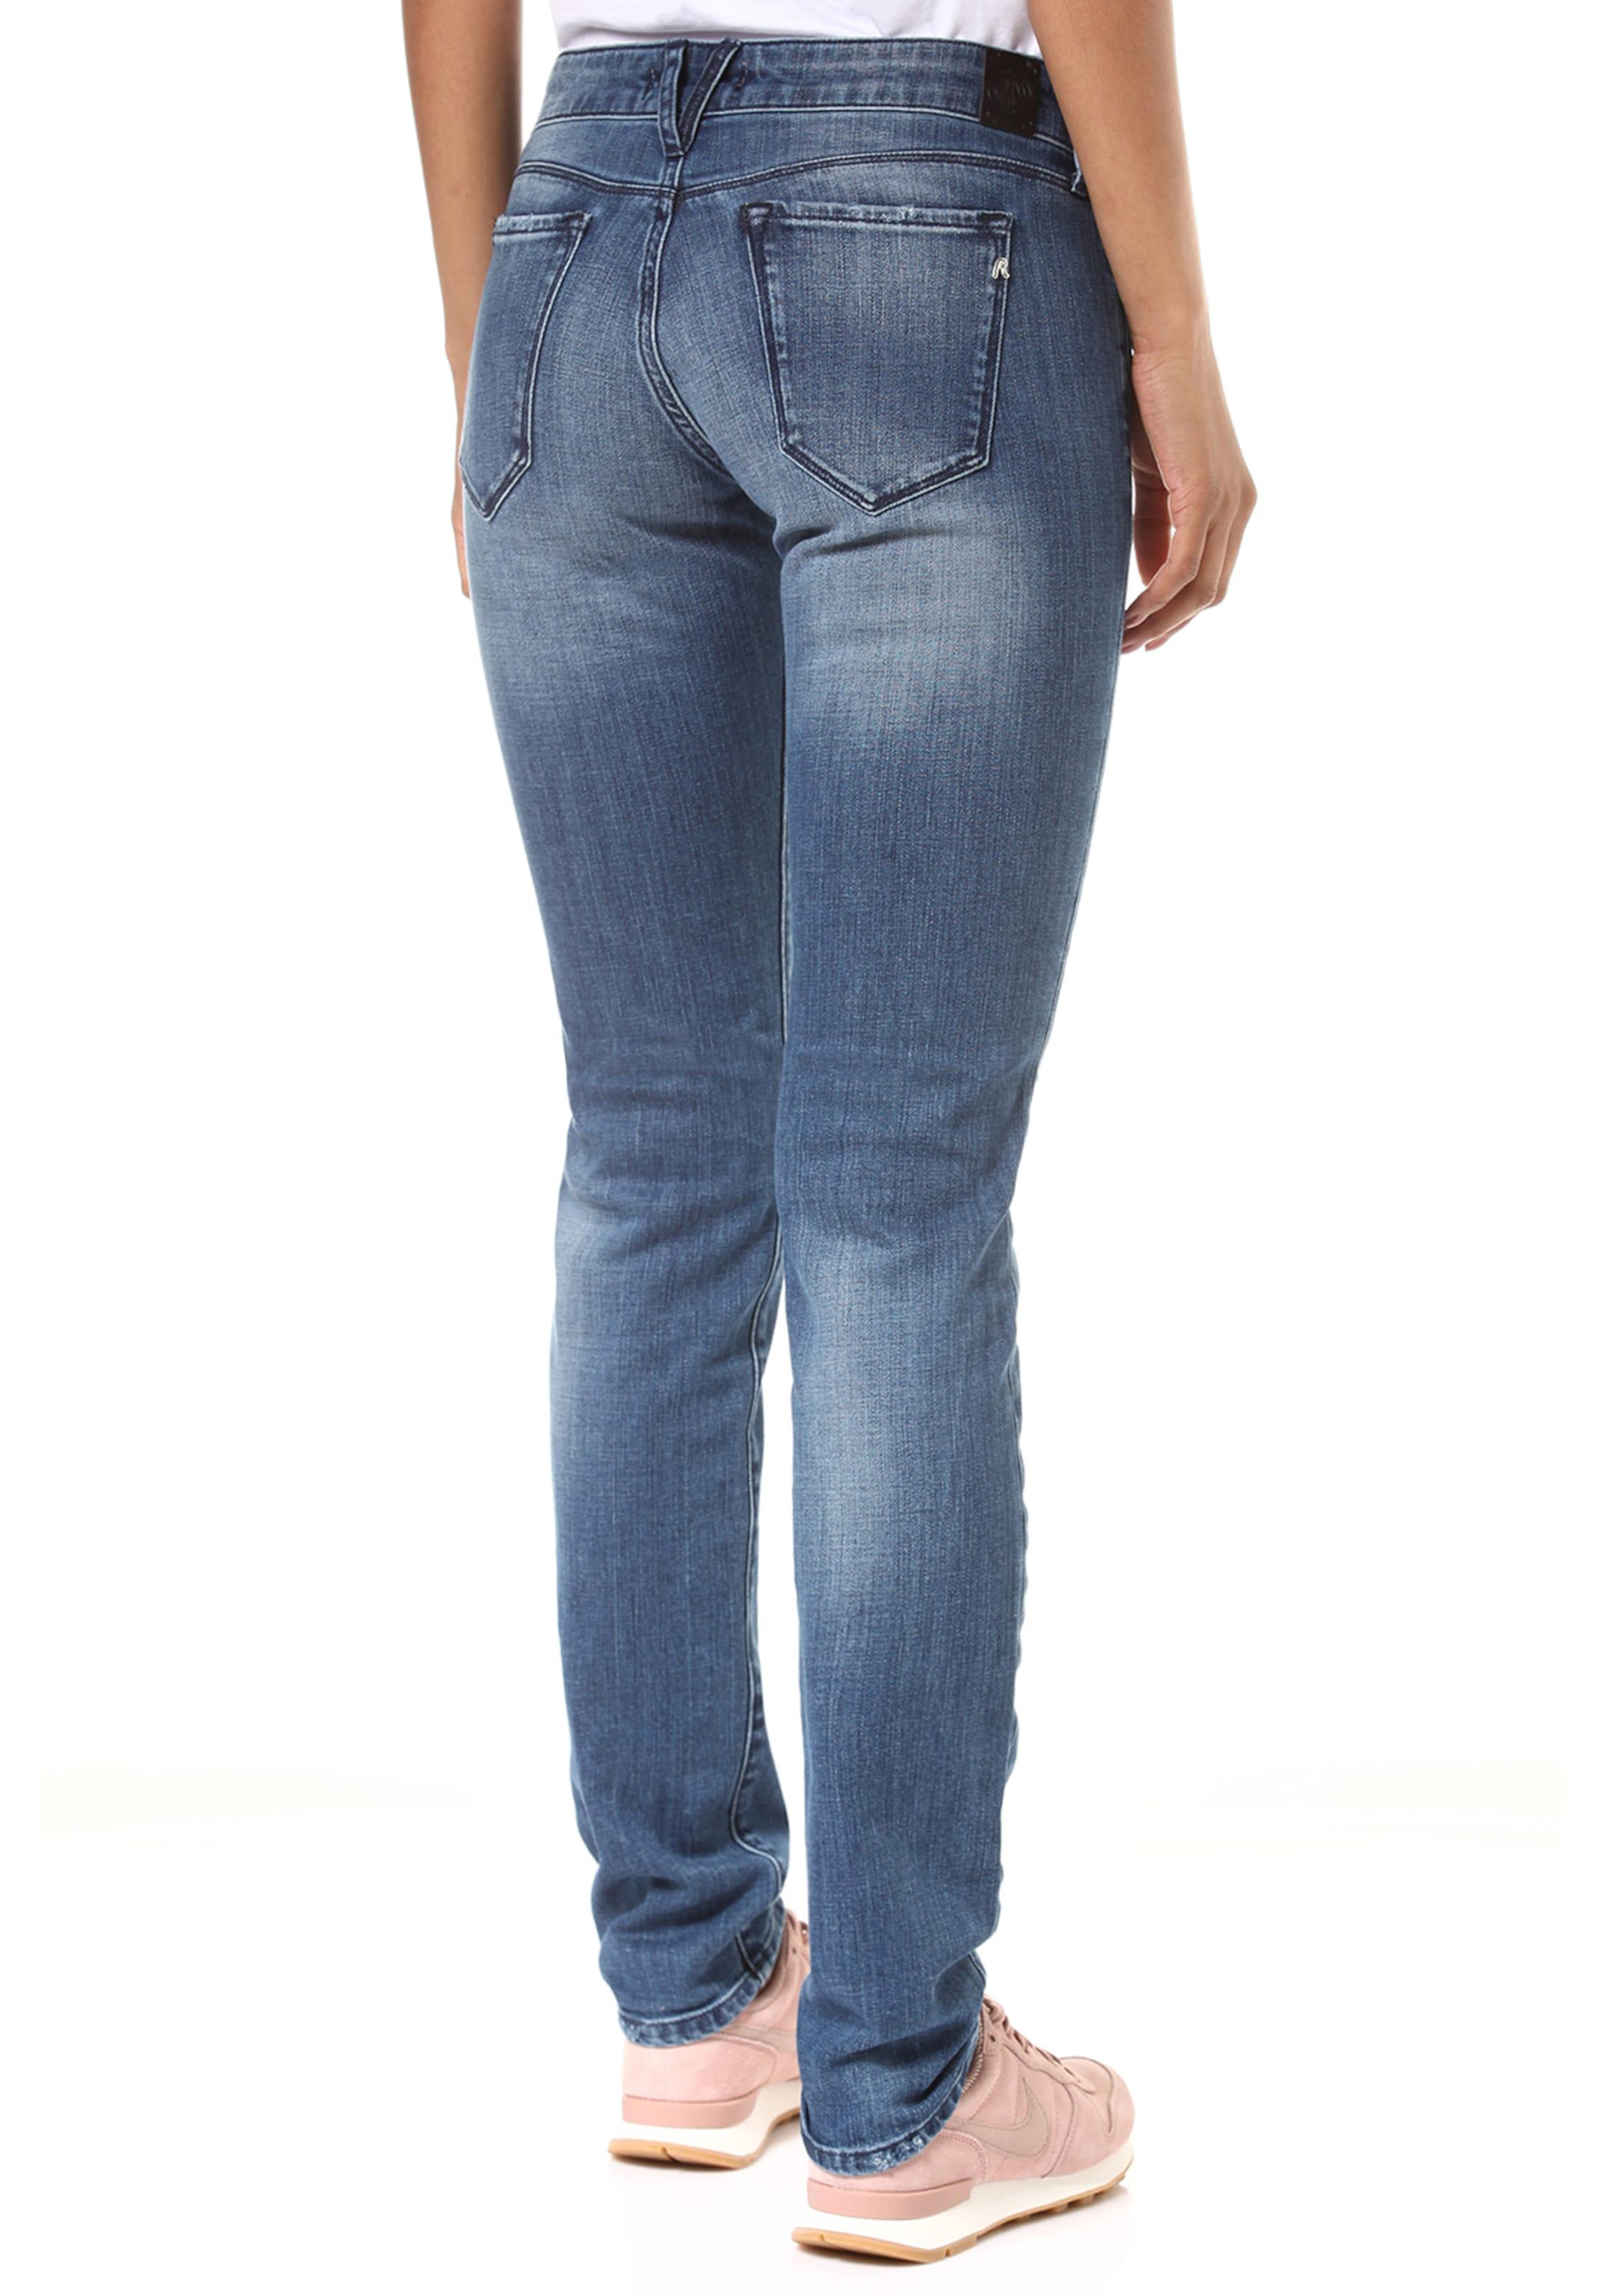 In 'rose' Denim Replay Jeans Blue xeWEQordCB